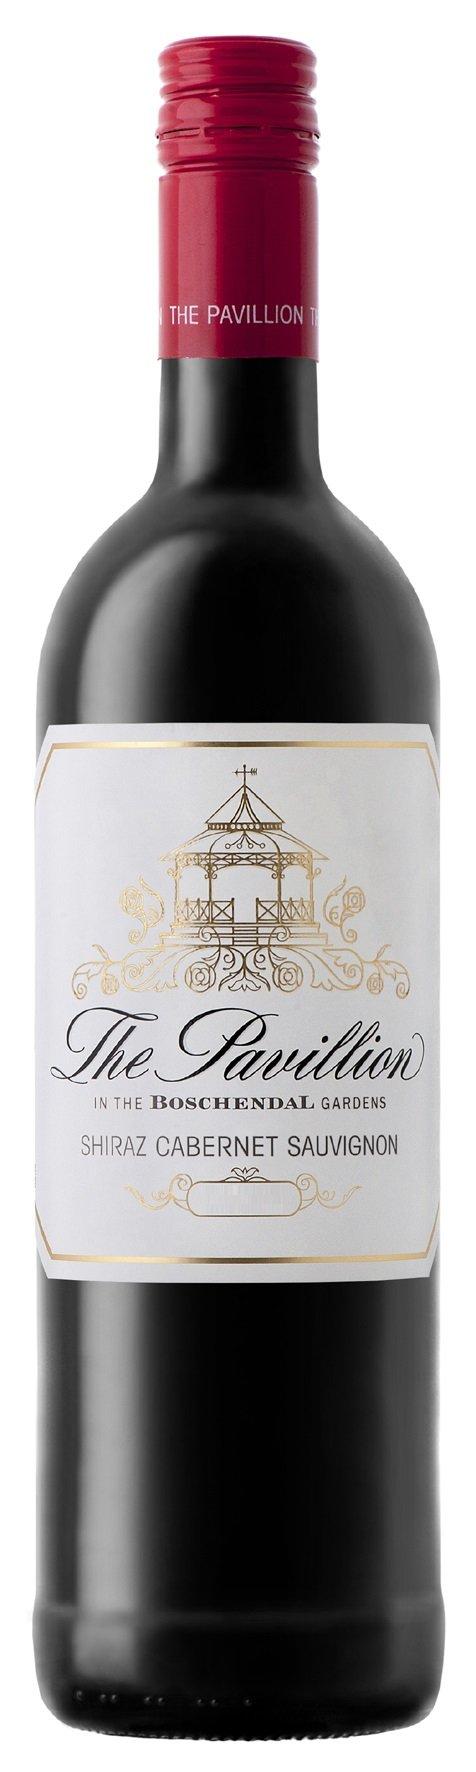 6x-075l-2017er-Boschendal-The-Pavillion-Shiraz-Cabernet-Sauvignon-Western-Cape-WO-Sdafrika-Rotwein-trocken